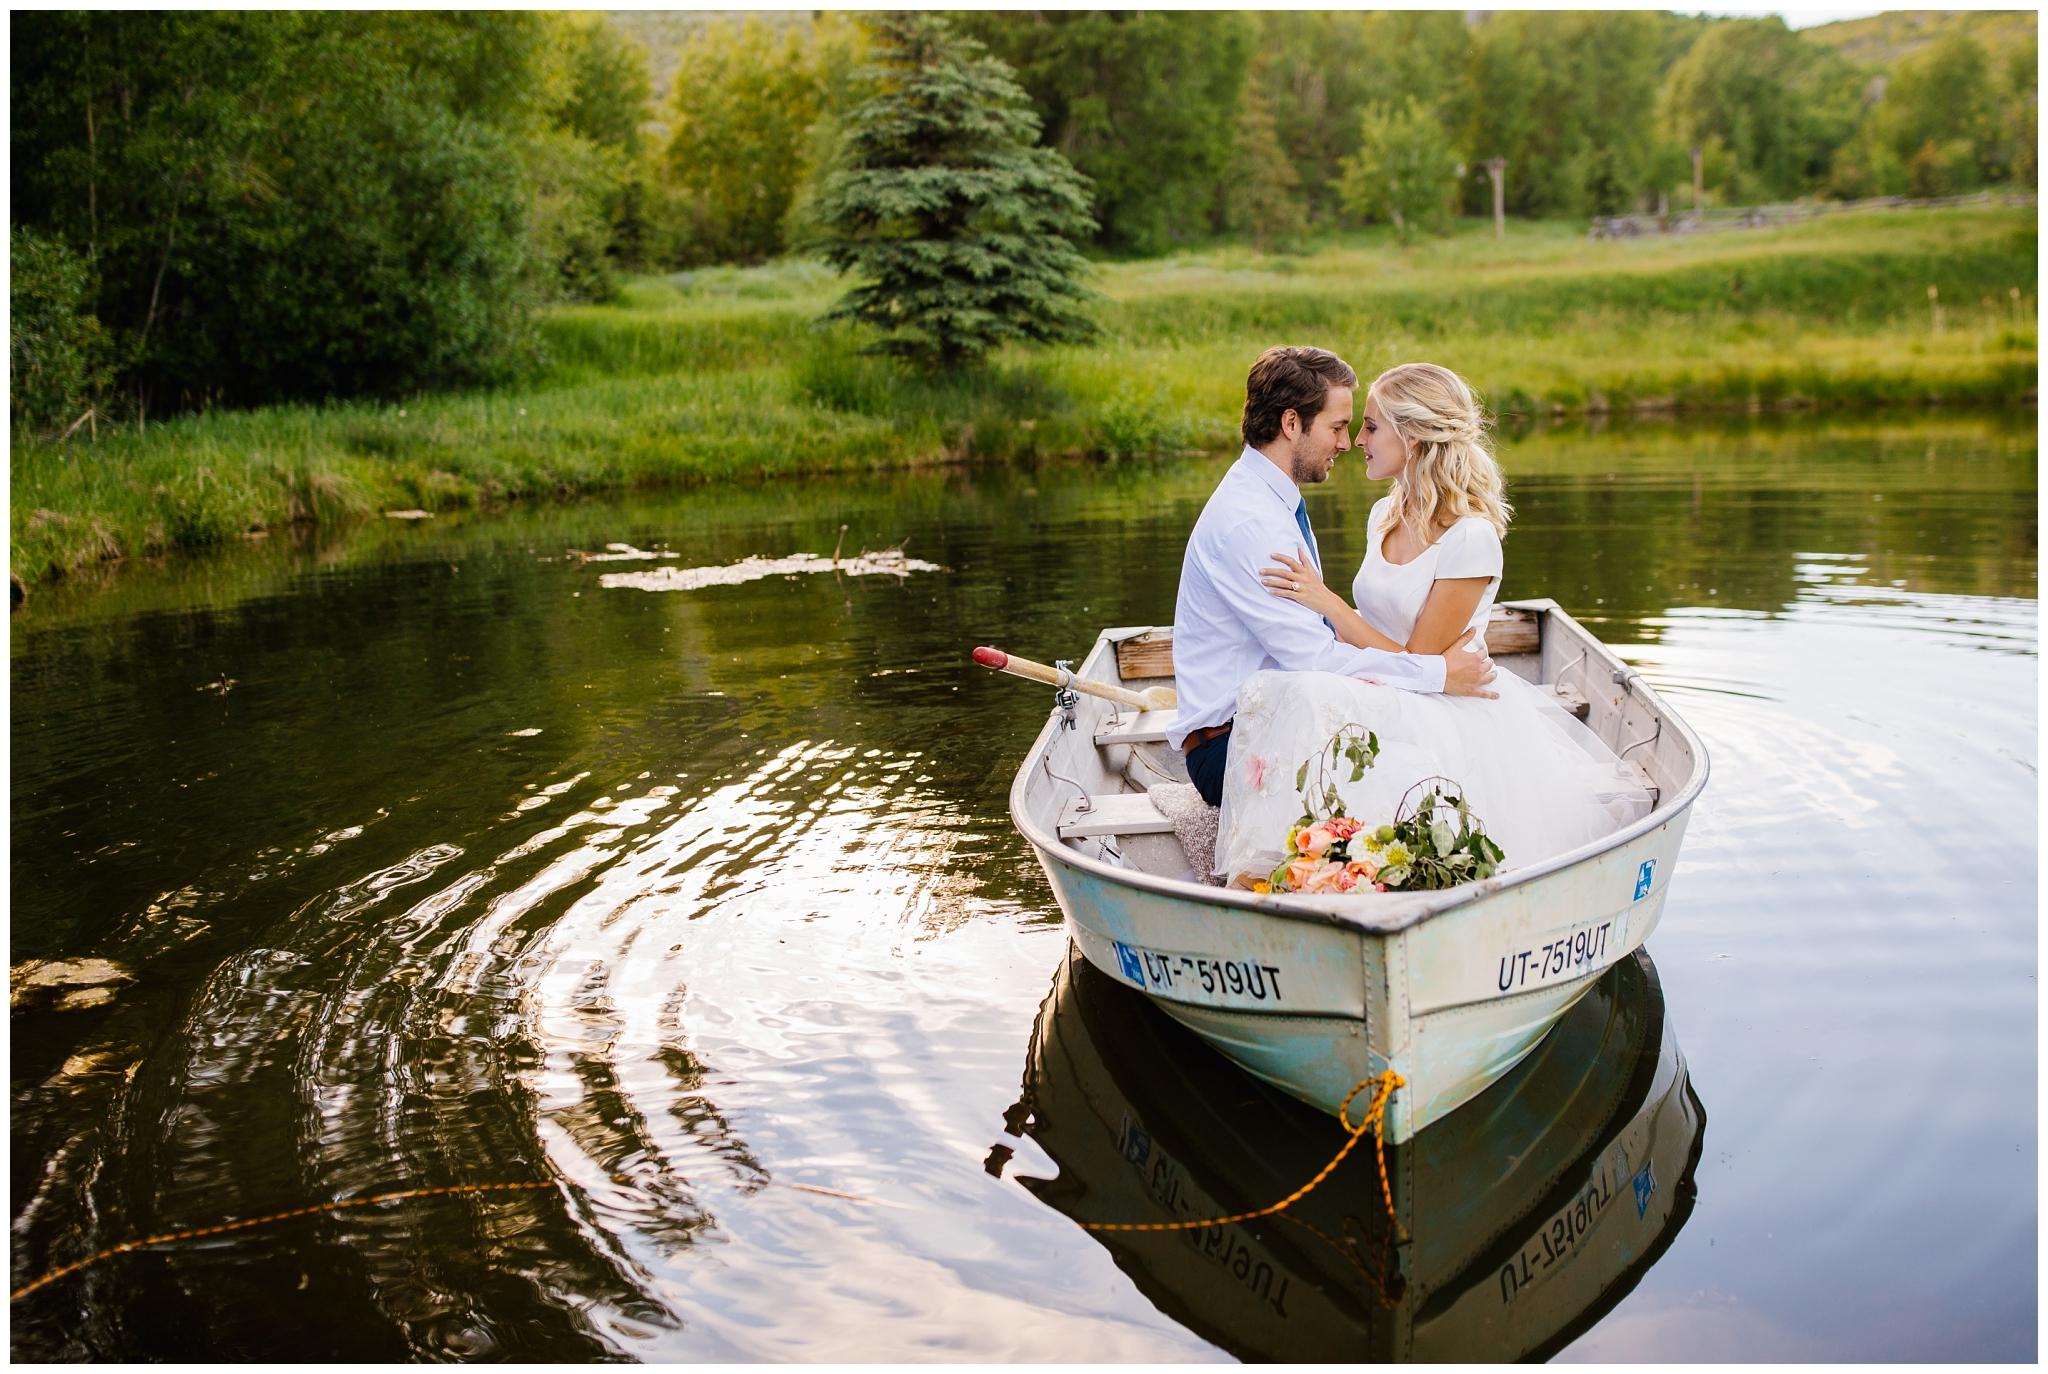 Lizzie-B-Imagery-Utah-Wedding-Photographer-Park-City-Photographer_0047.jpg